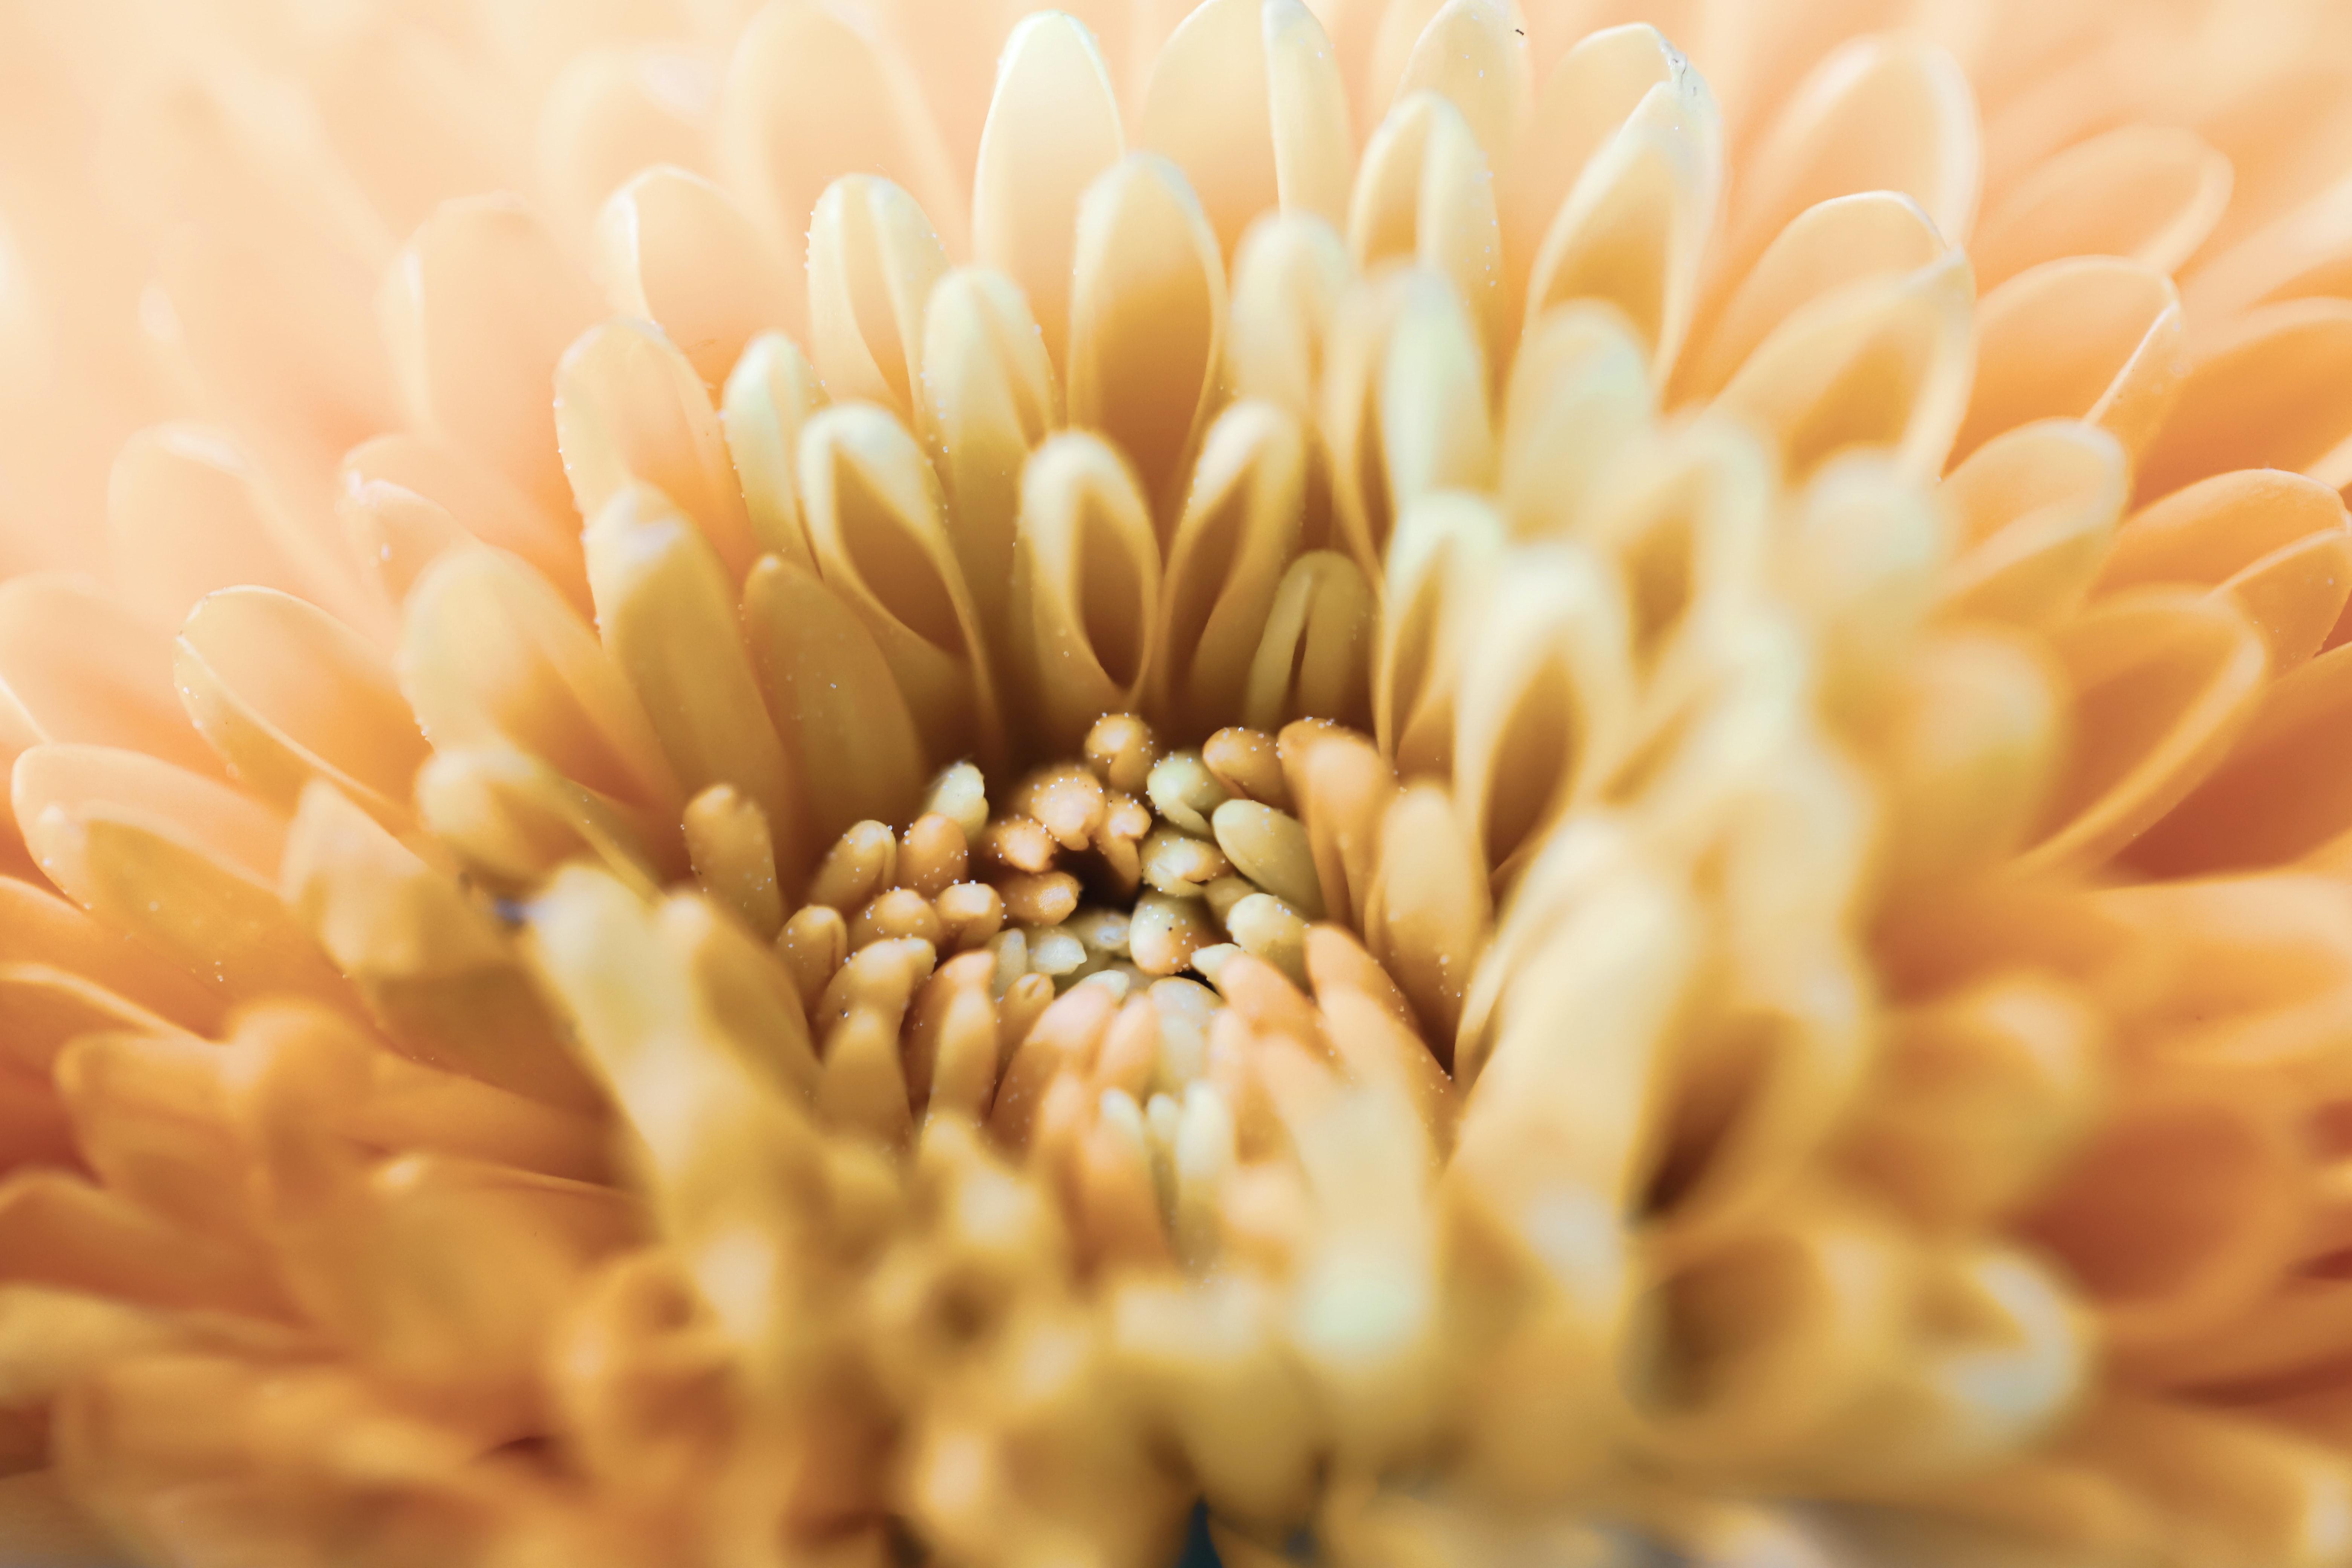 118755 download wallpaper Macro, Chrysanthemum, Flower, Petals screensavers and pictures for free